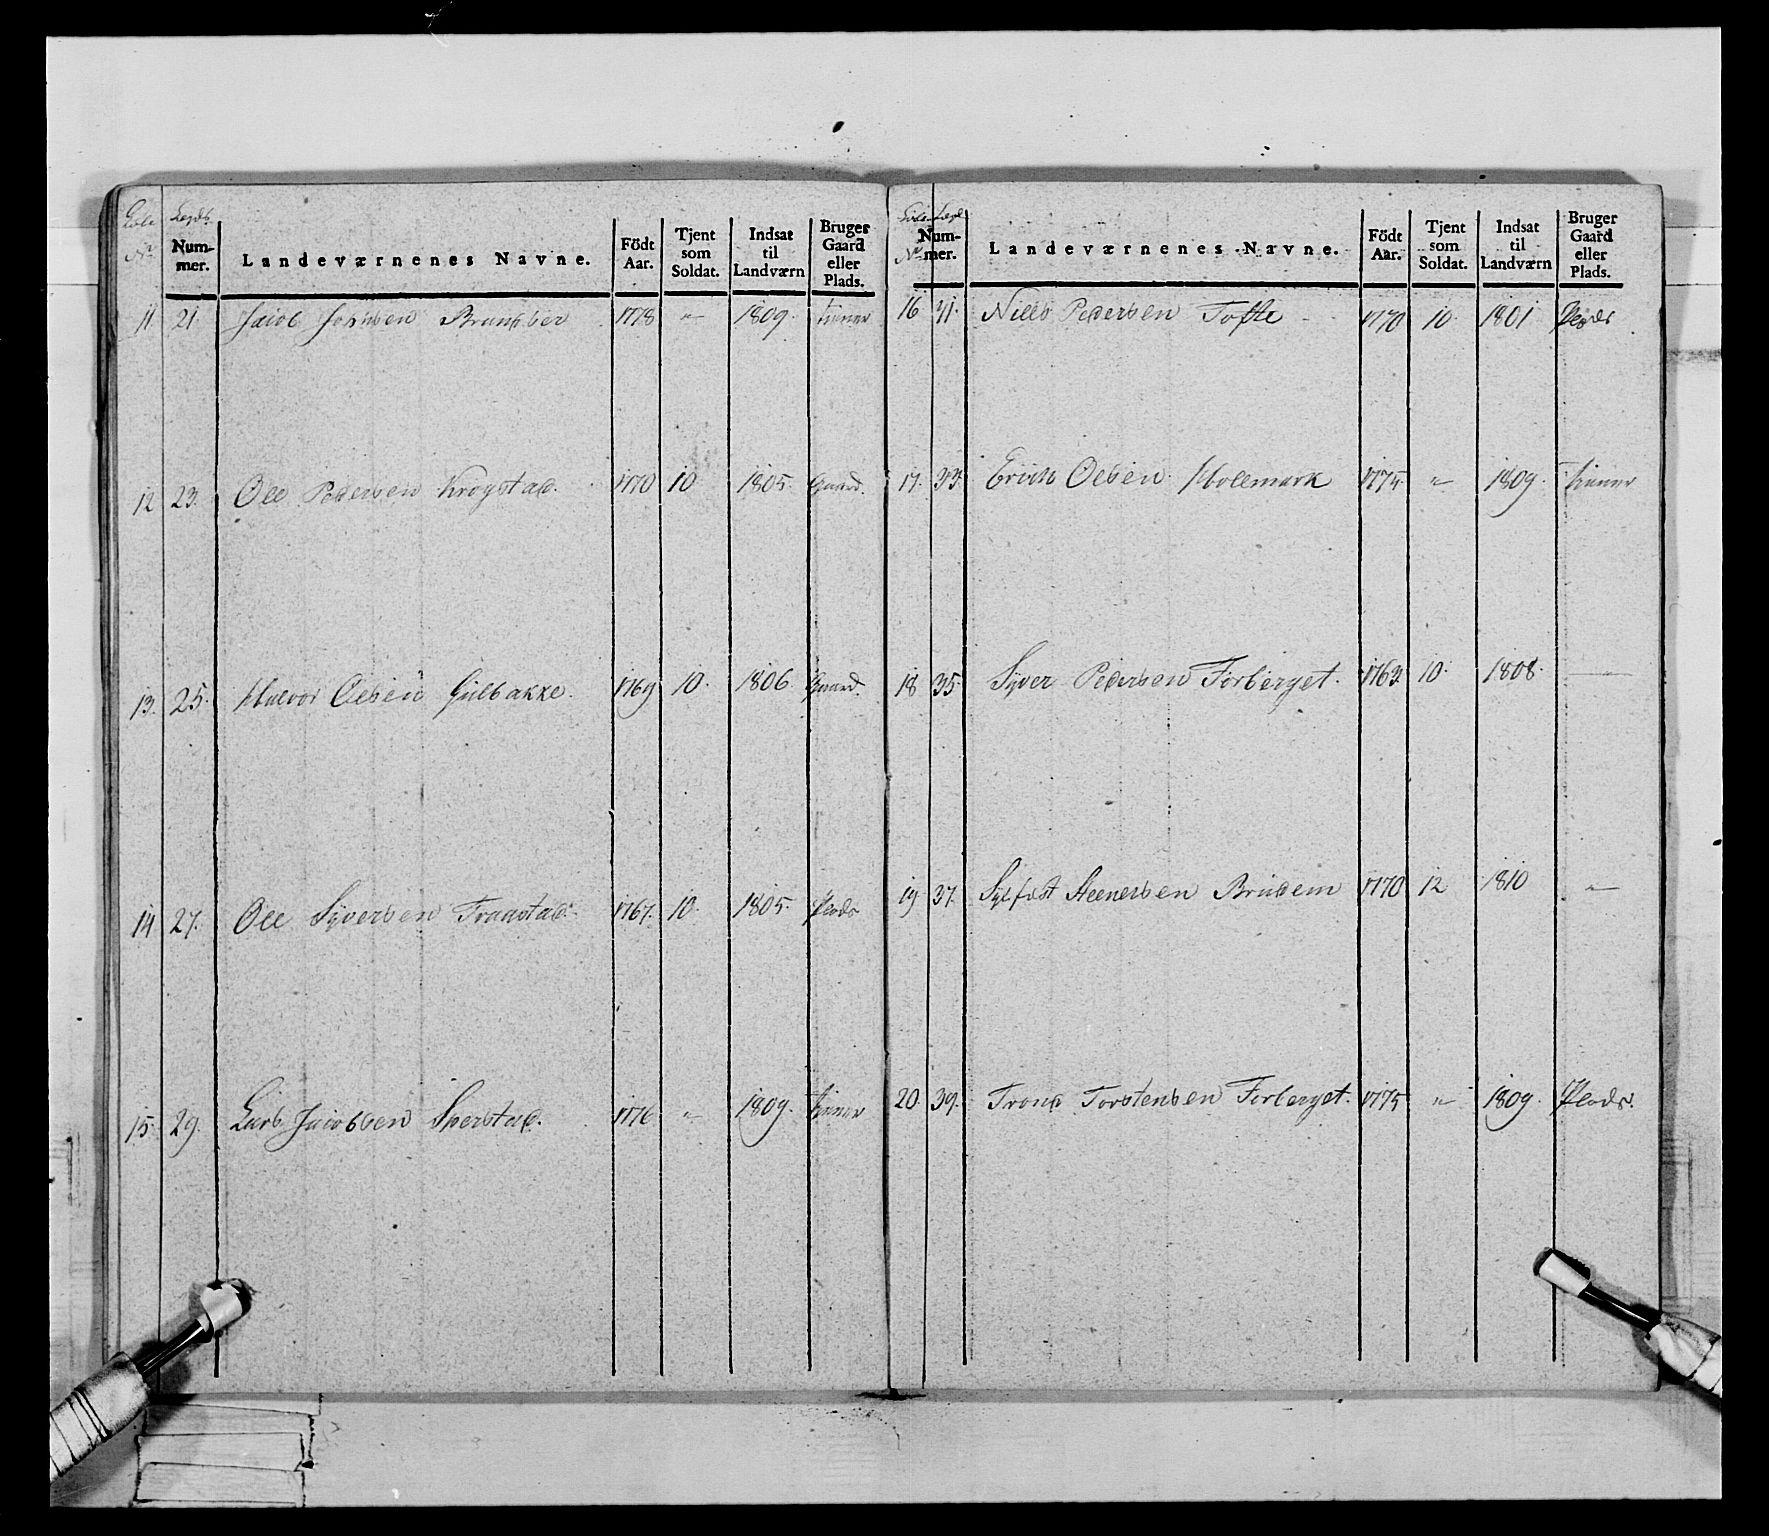 RA, Generalitets- og kommissariatskollegiet, Det kongelige norske kommissariatskollegium, E/Eh/L0069: Opplandske gevorbne infanteriregiment, 1810-1818, s. 647